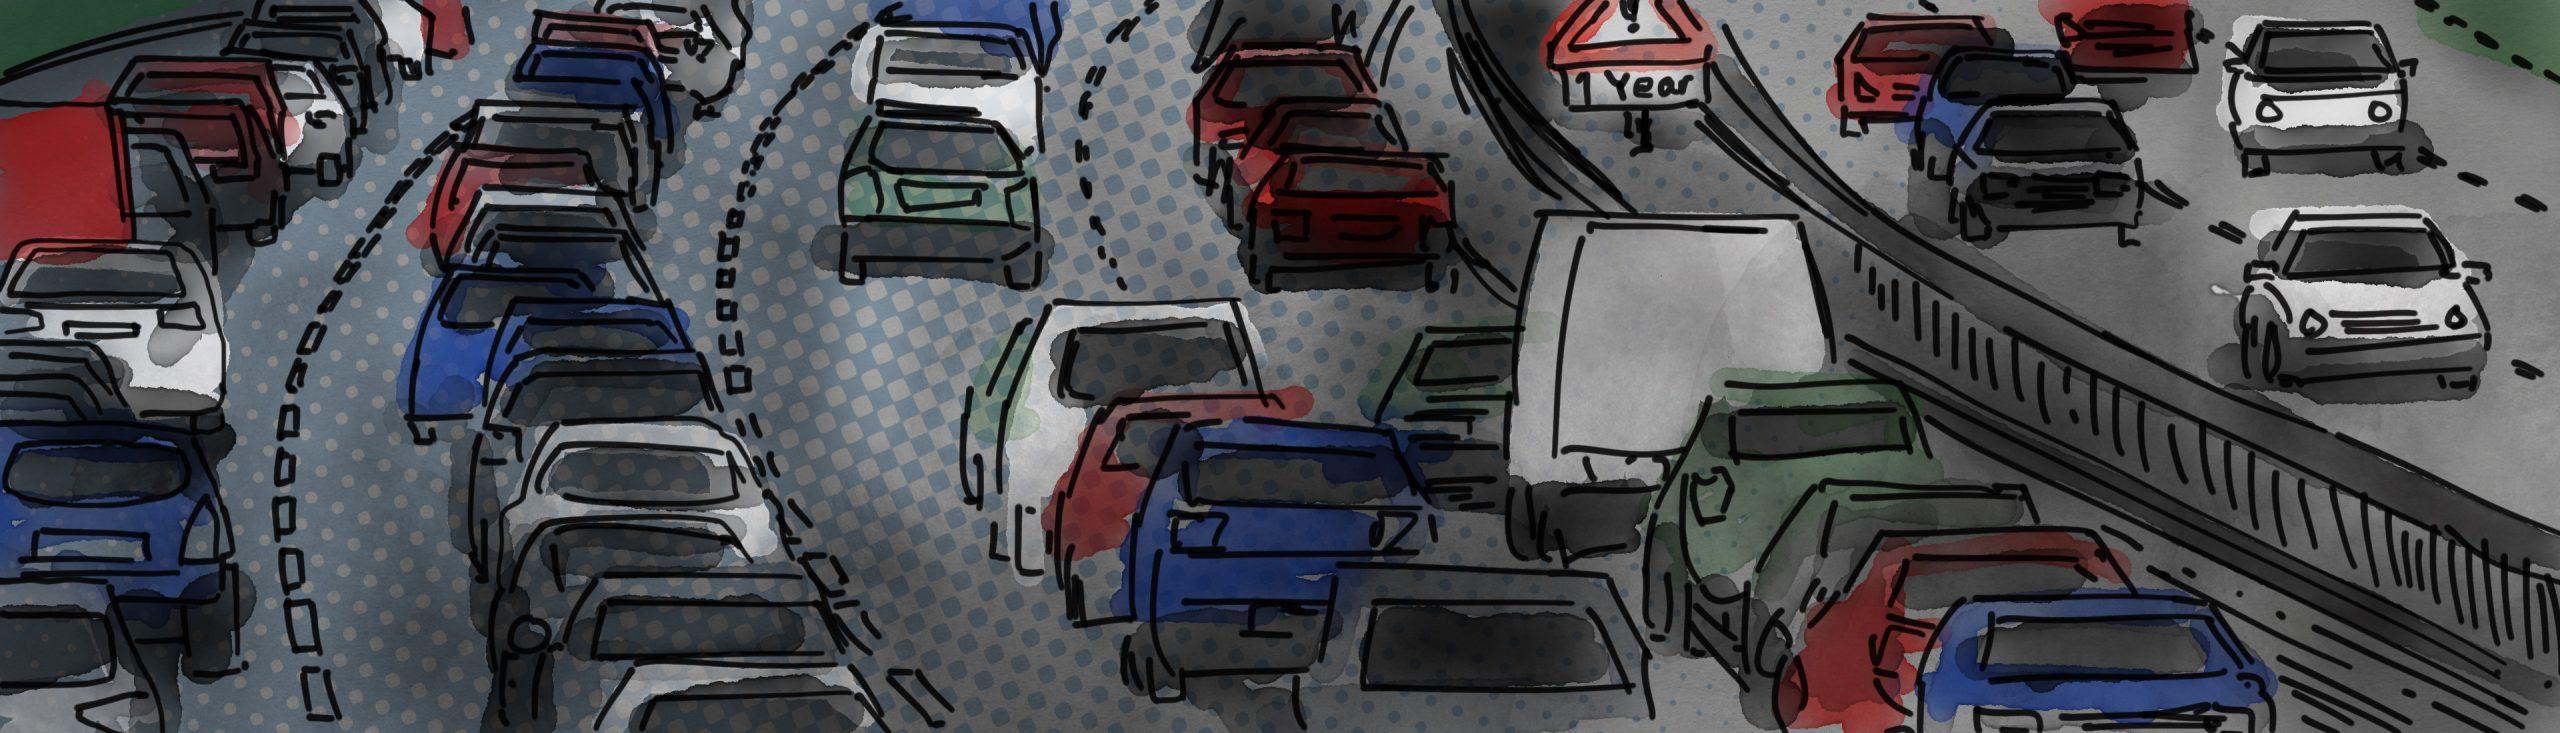 Transport congestion, blog head image